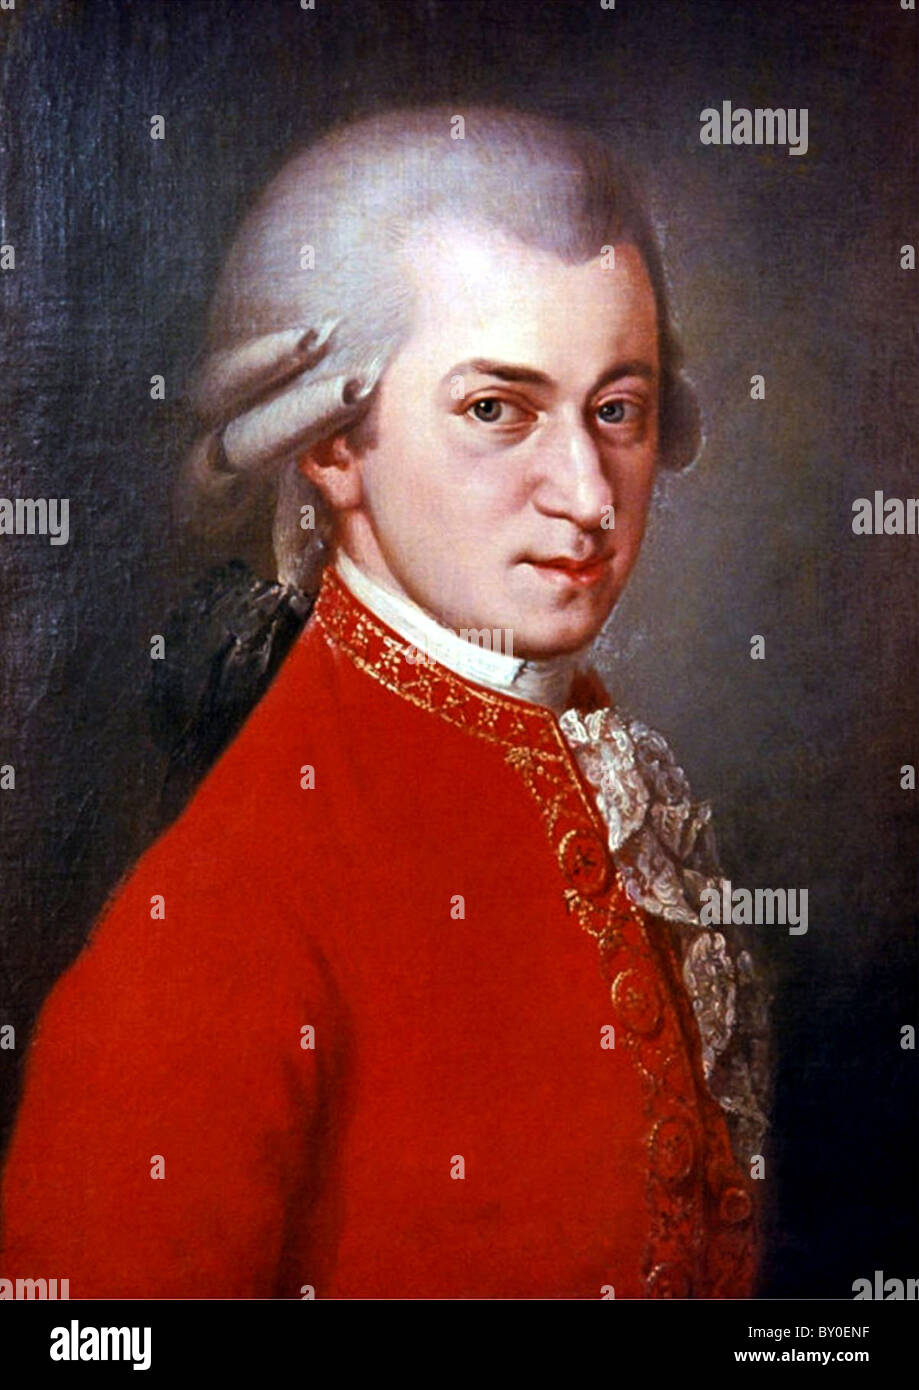 Mozart, Composer Wolfgang Amadeus Mozart Stock Photo